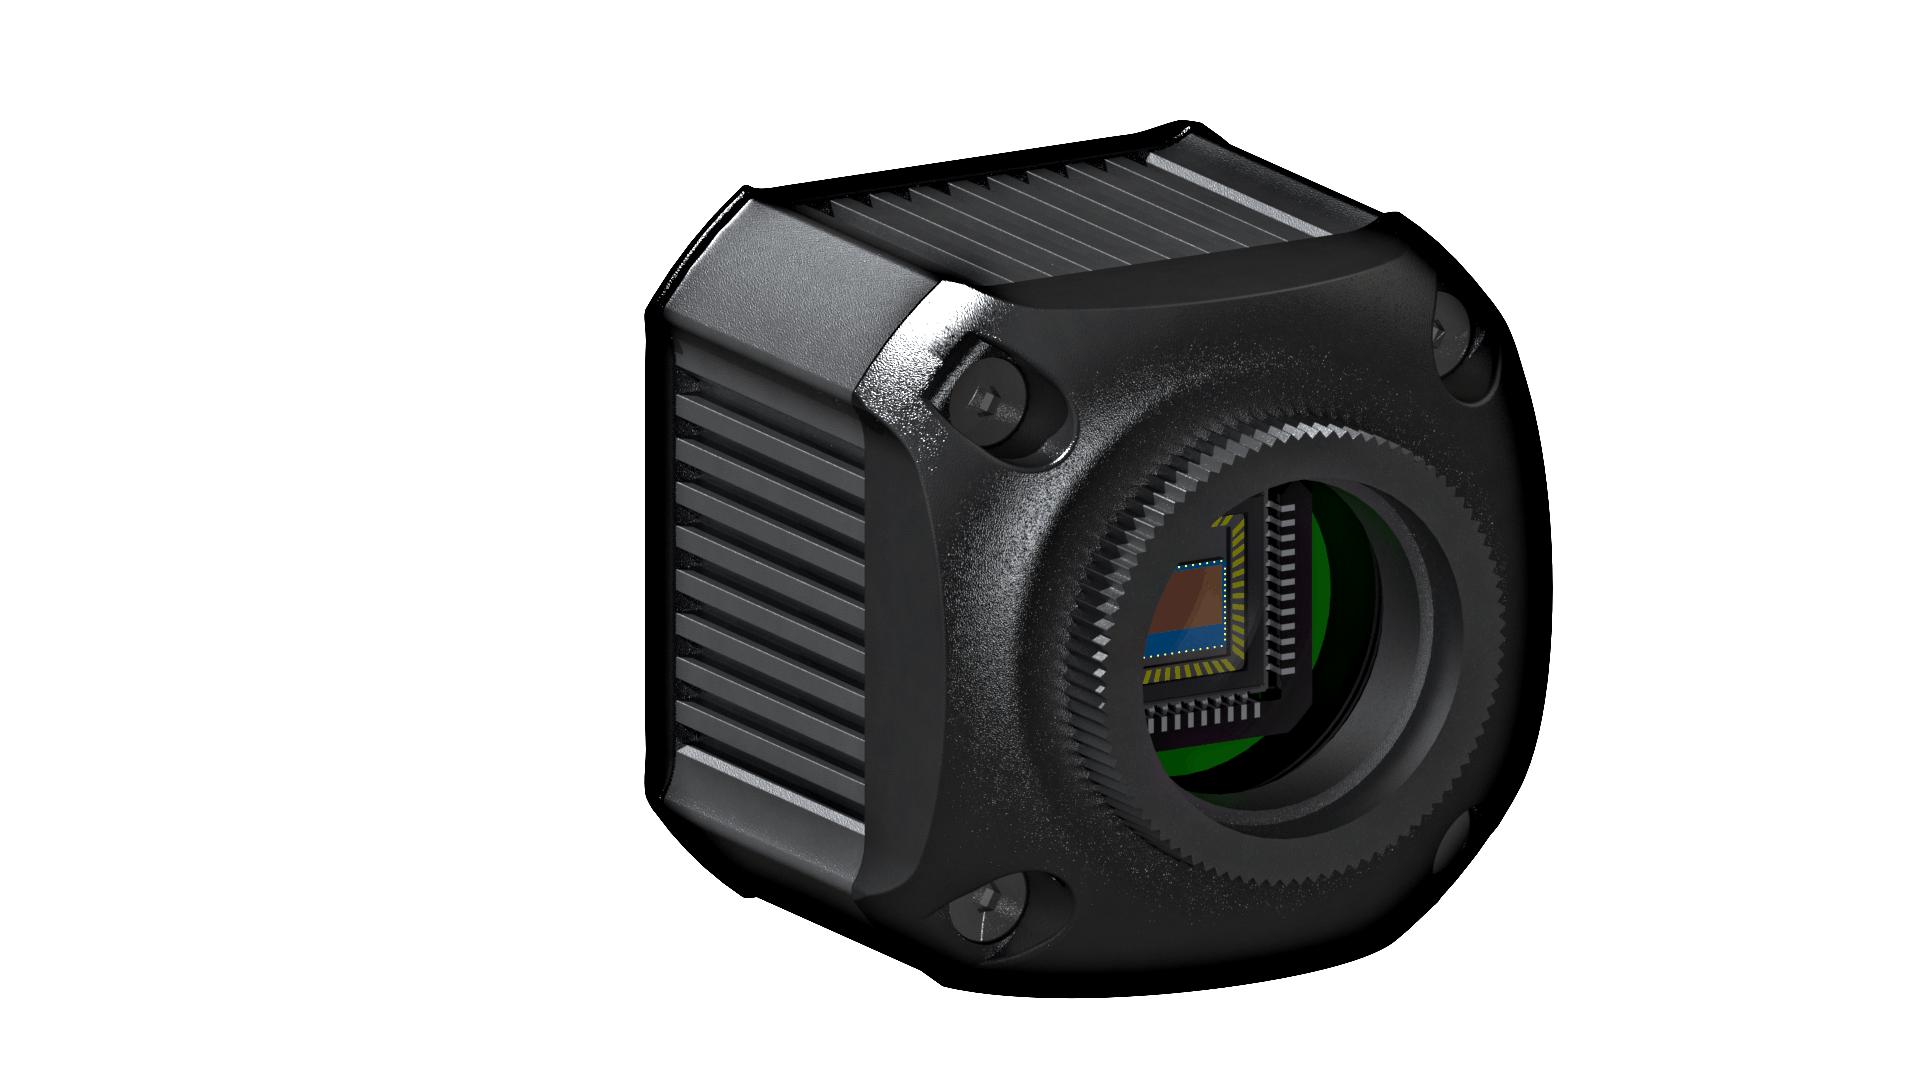 MAGIC camera smart series mc1005